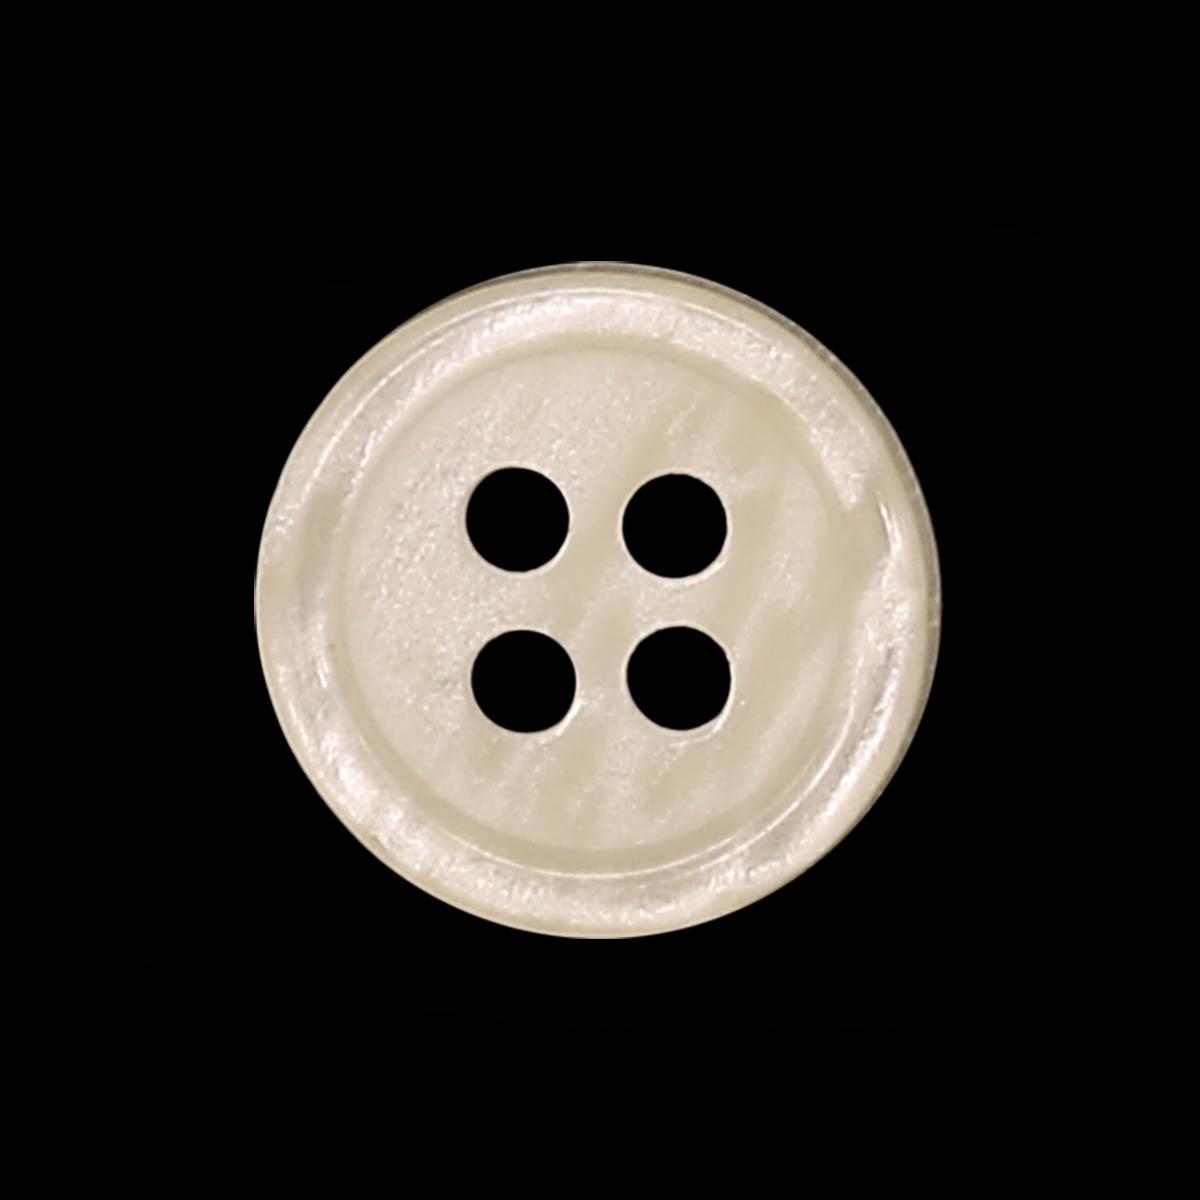 35483/4 18 (3561) Пуговица 4прокола крем.глянц .полиэстер ГР